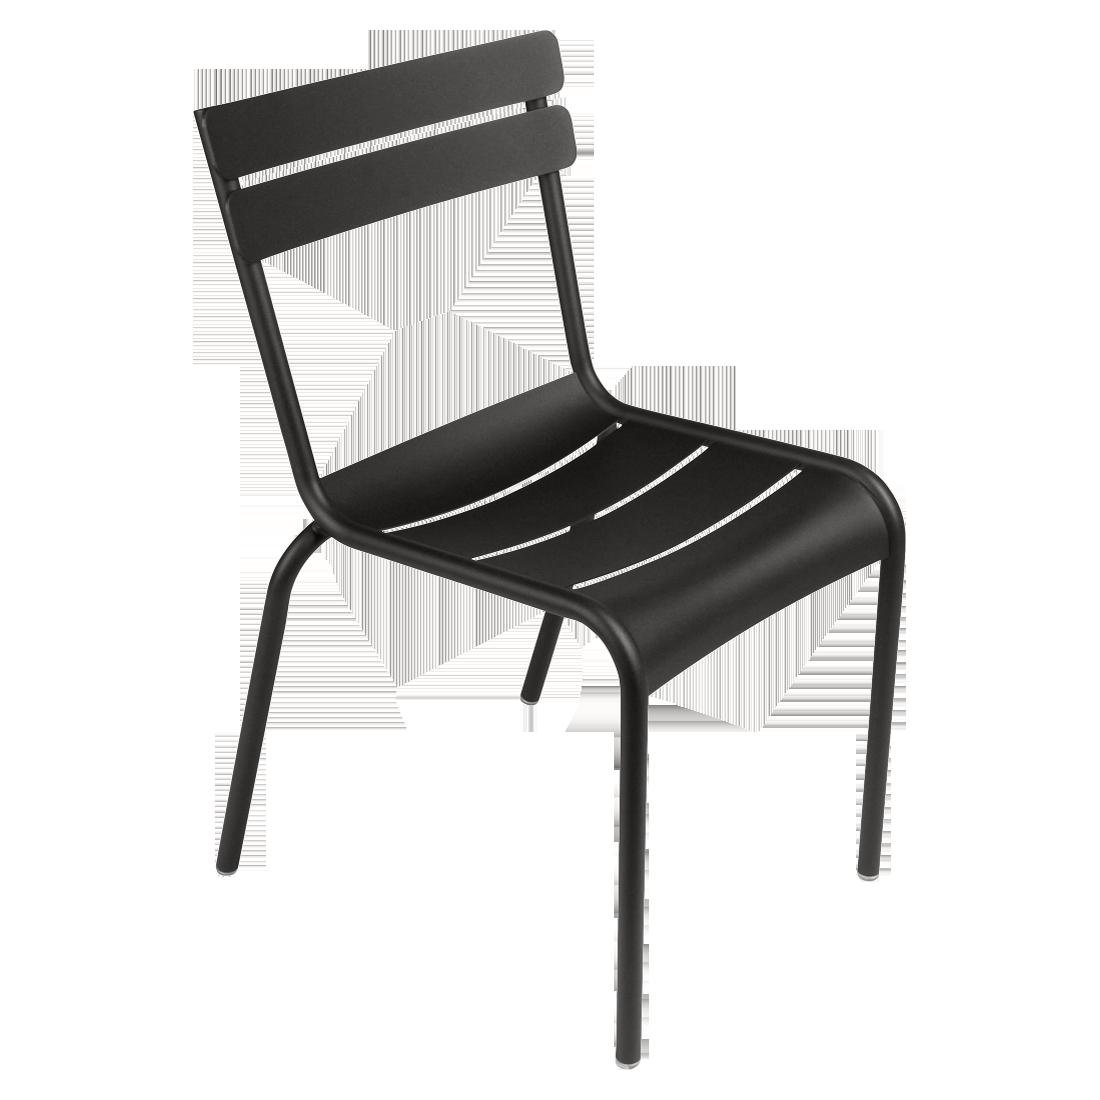 Chaise luxembourg de fermob r glisse - Chaise fermob luxembourg ...